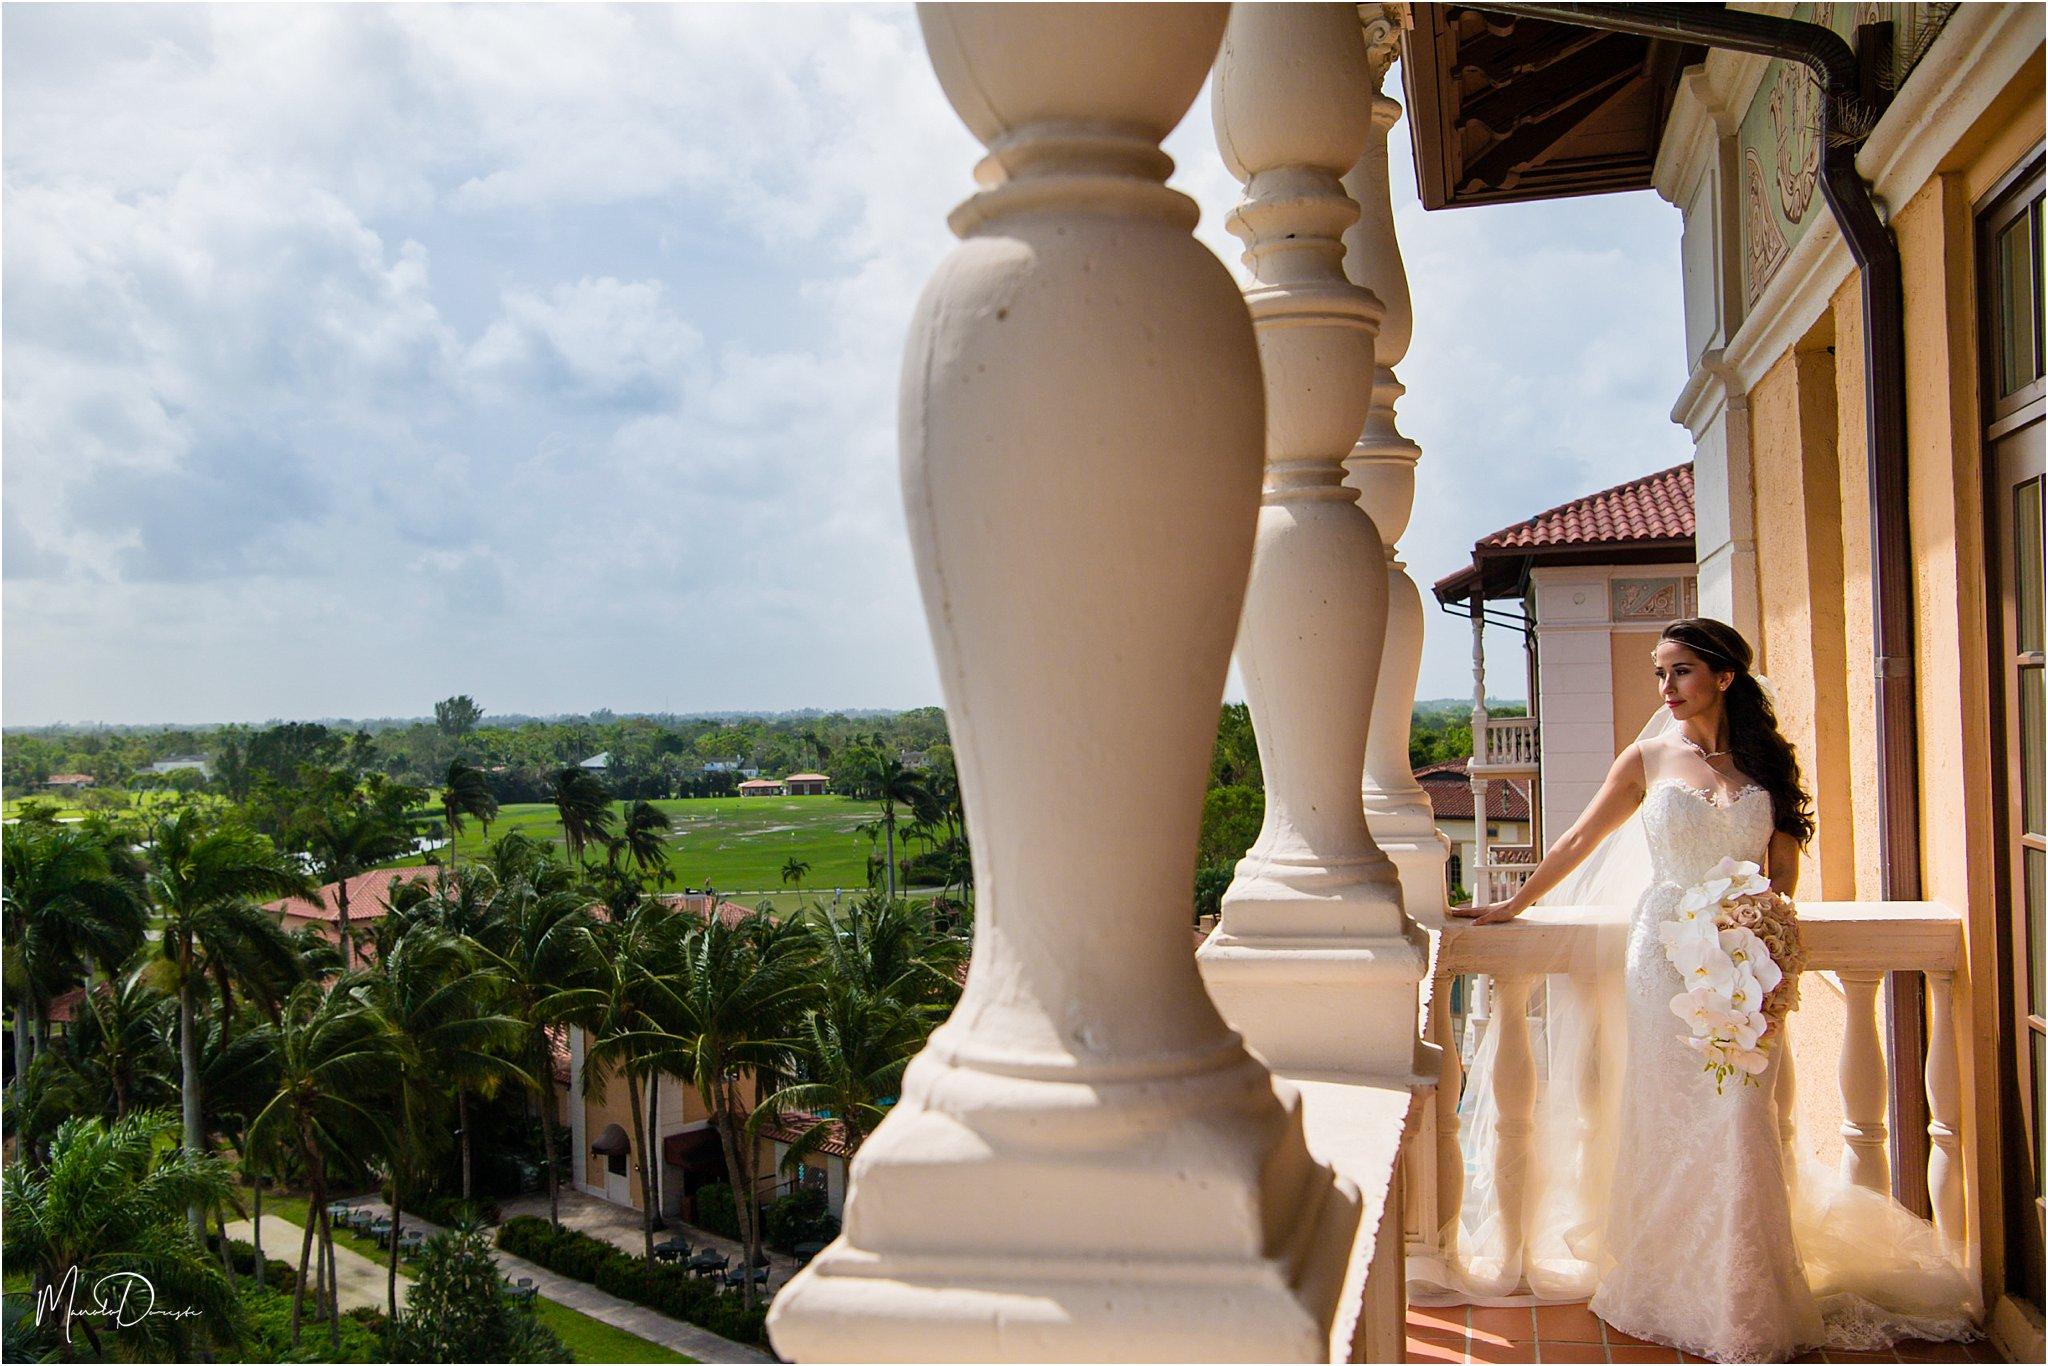 0155_ManoloDoreste_InFocusStudios_Wedding_Family_Photography_Miami_MiamiPhotographer.jpg